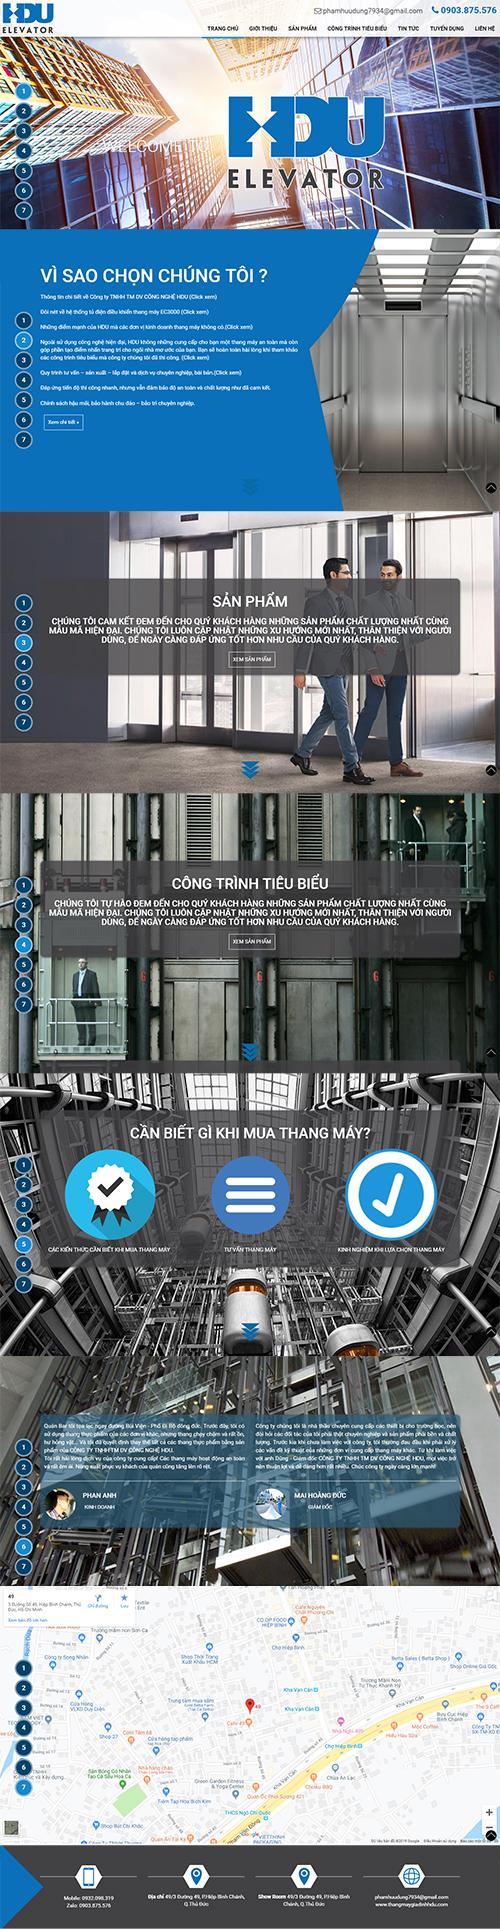 Mẫu website bán hàng CenaStore